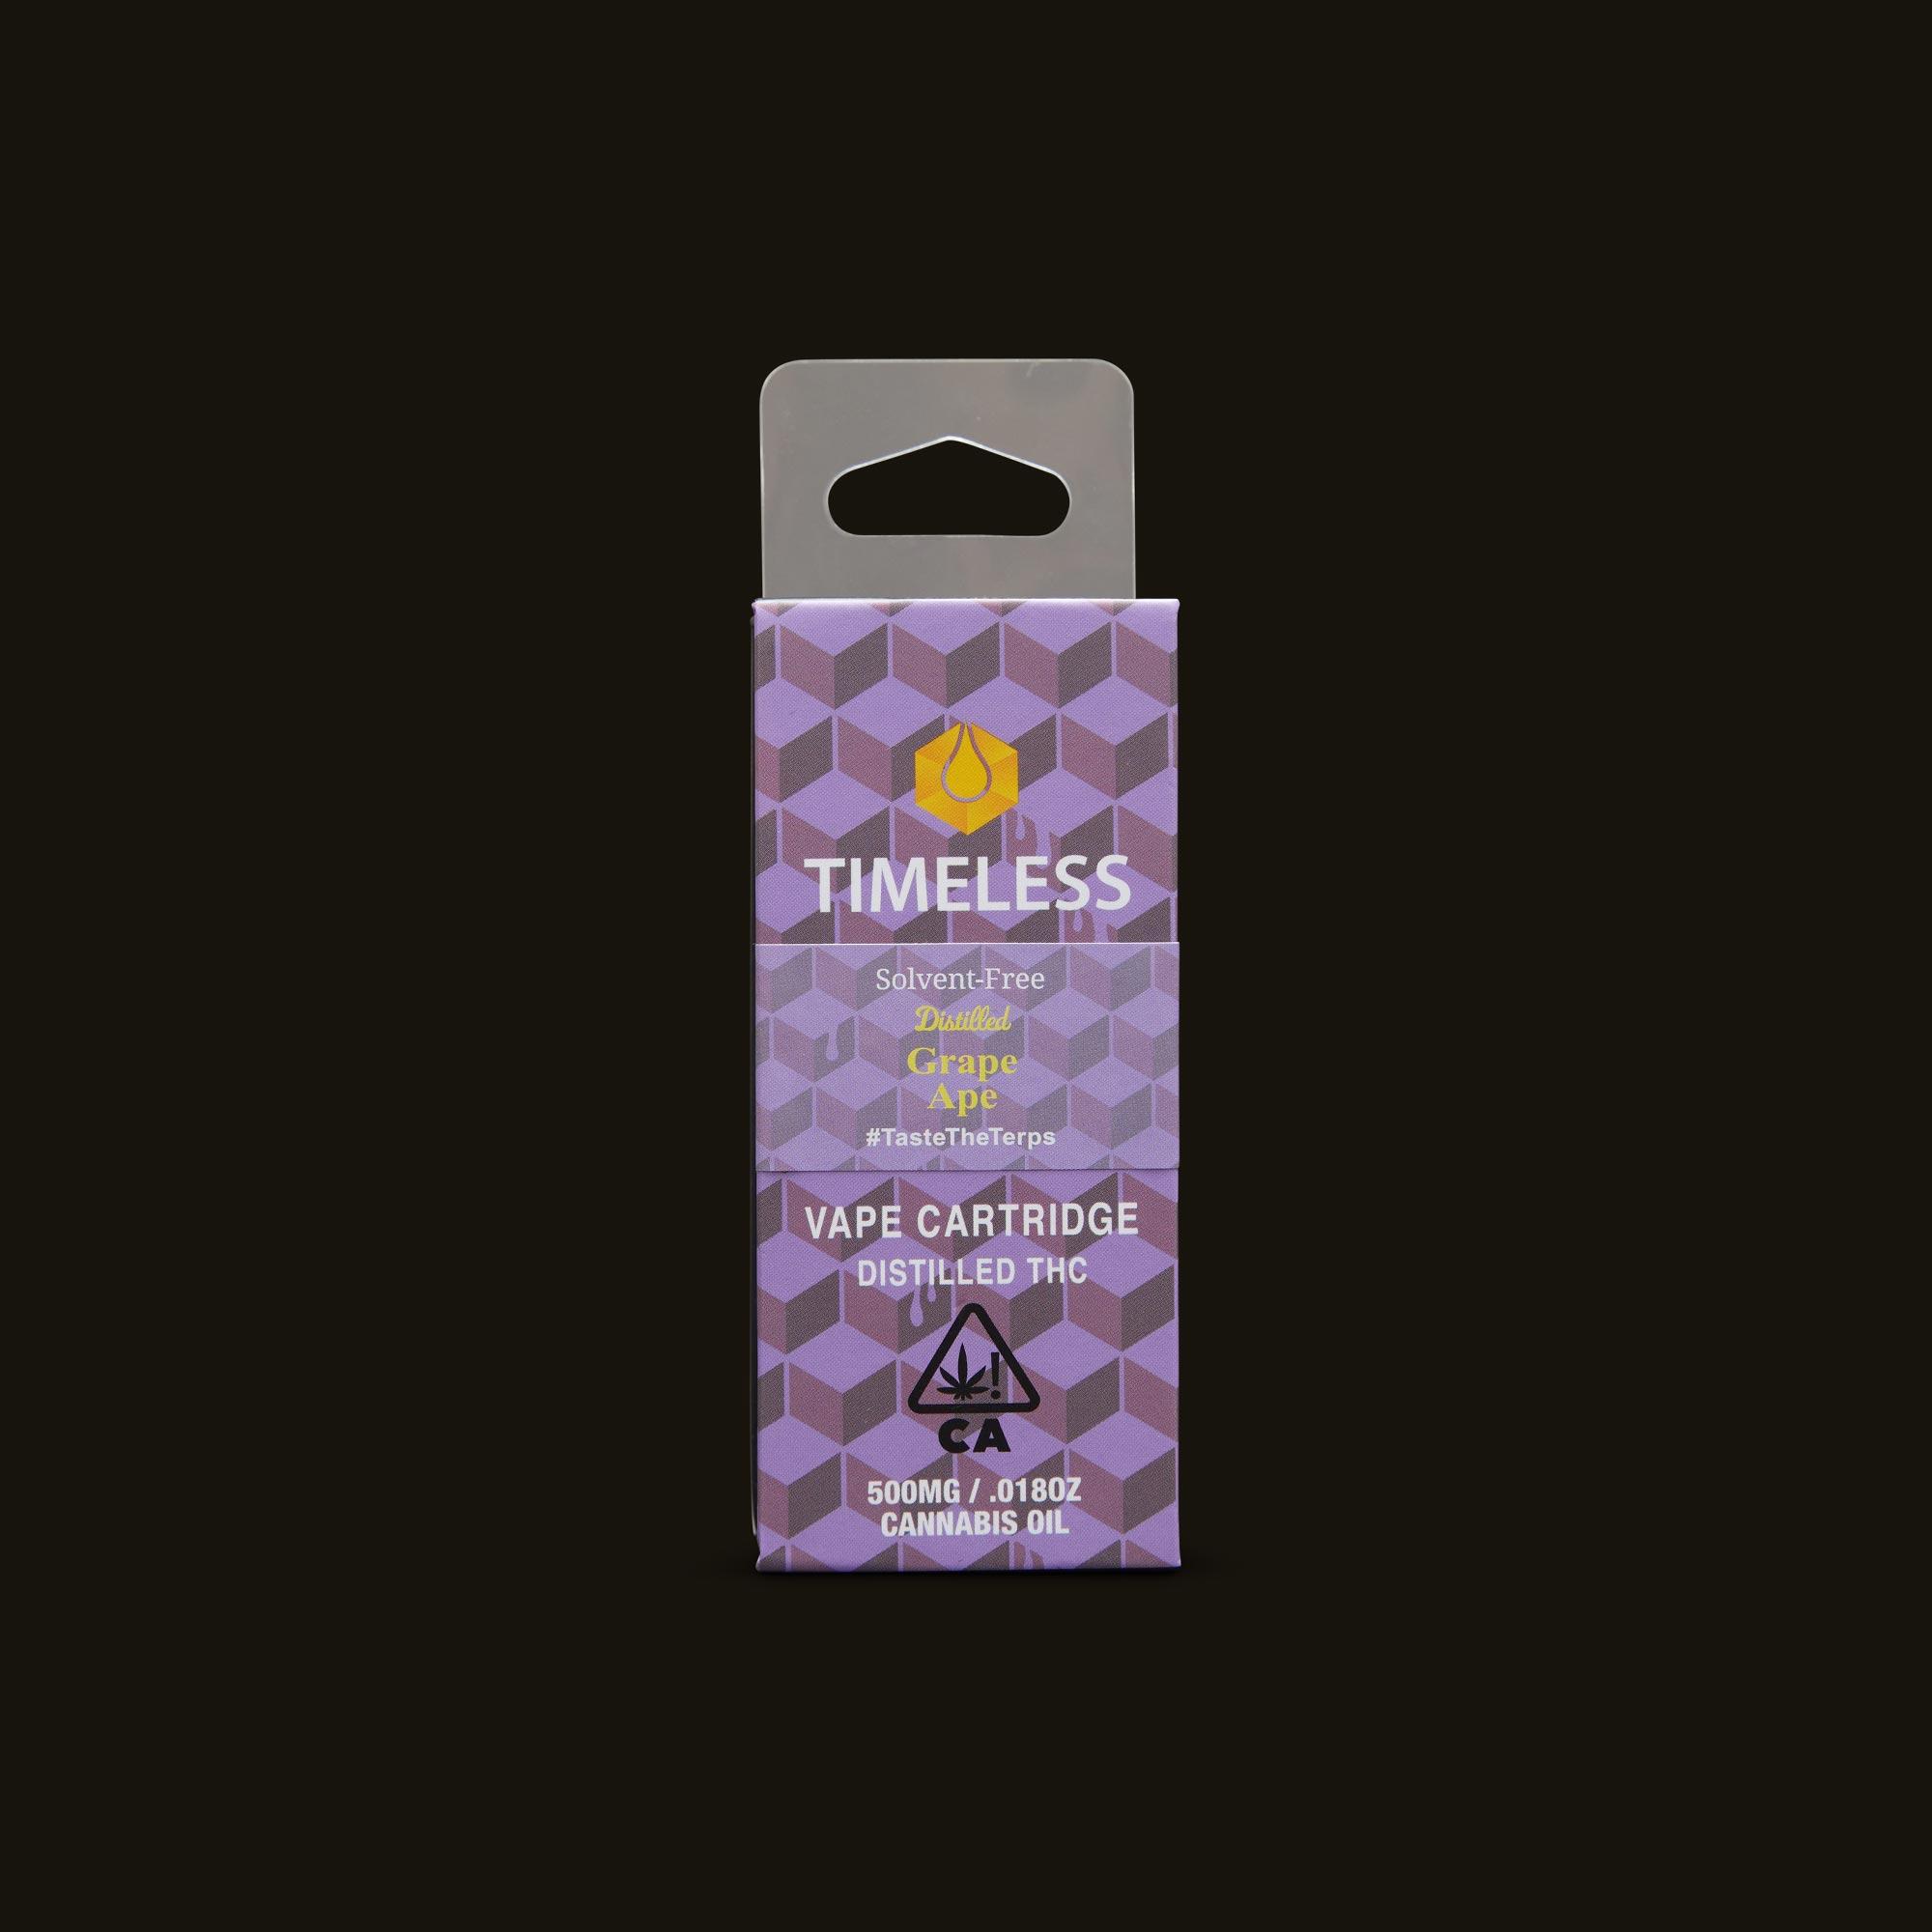 Timeless Vapes Grape Ape Cartridge Front Packaging